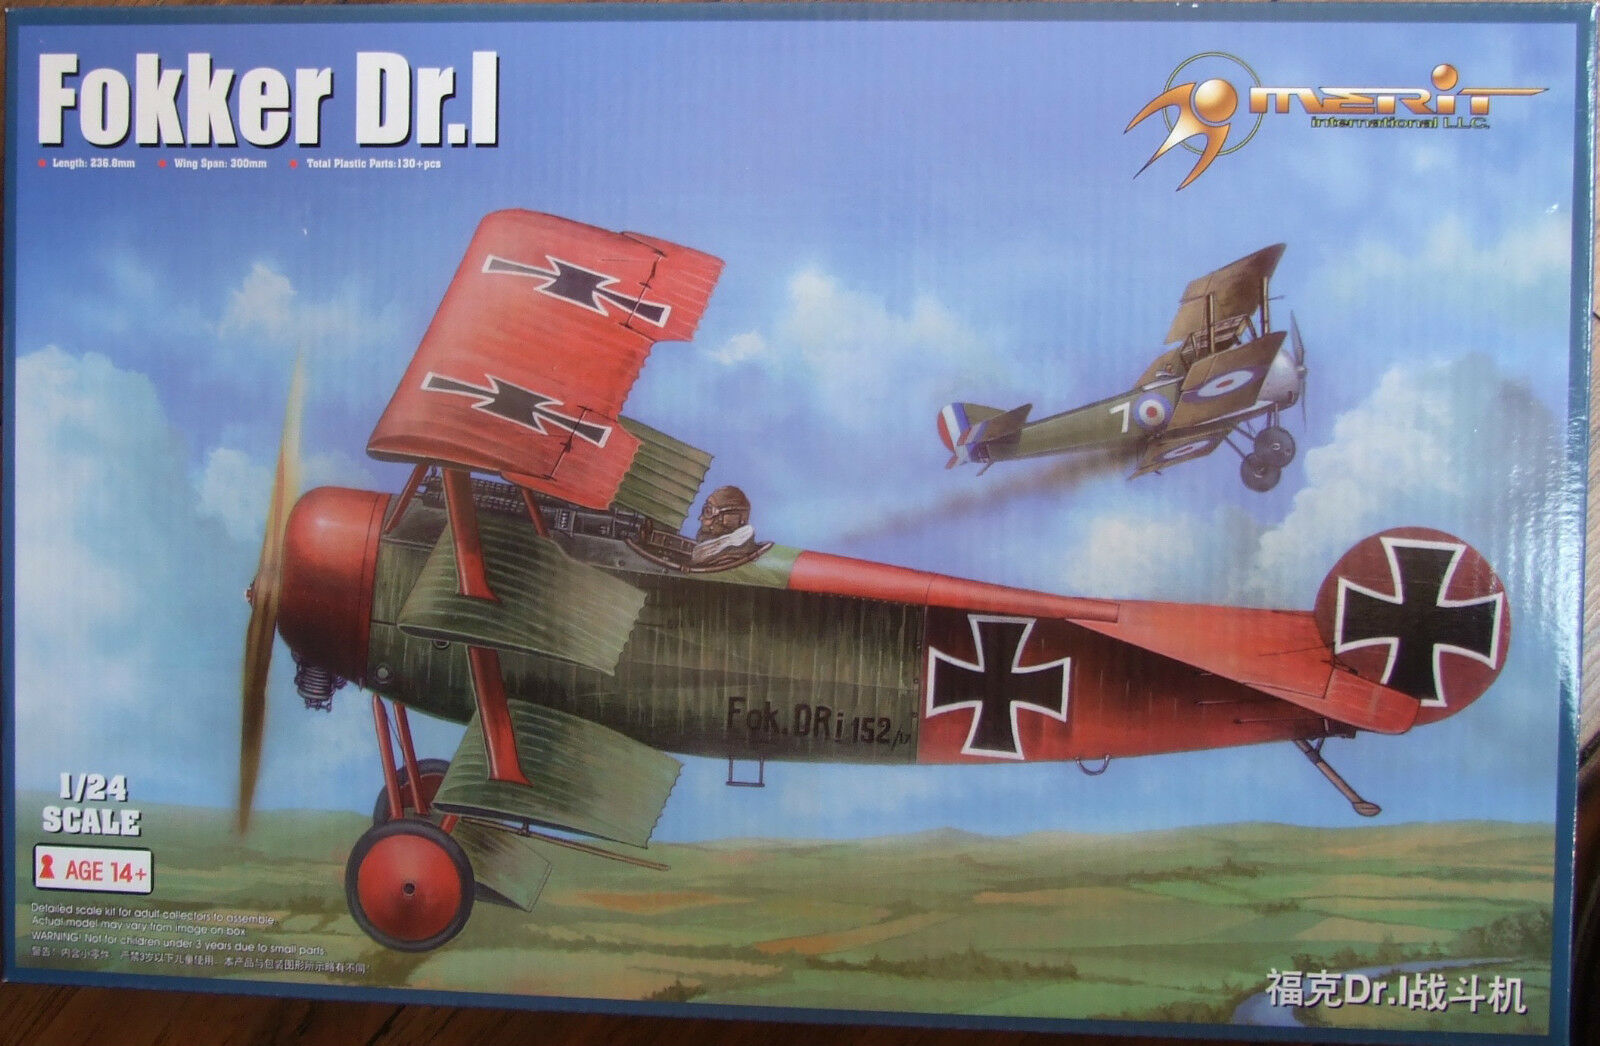 MERIT 1 24 FOKKER Dr.1 Triplane WWI plastic model fighter aircraft kit NEW